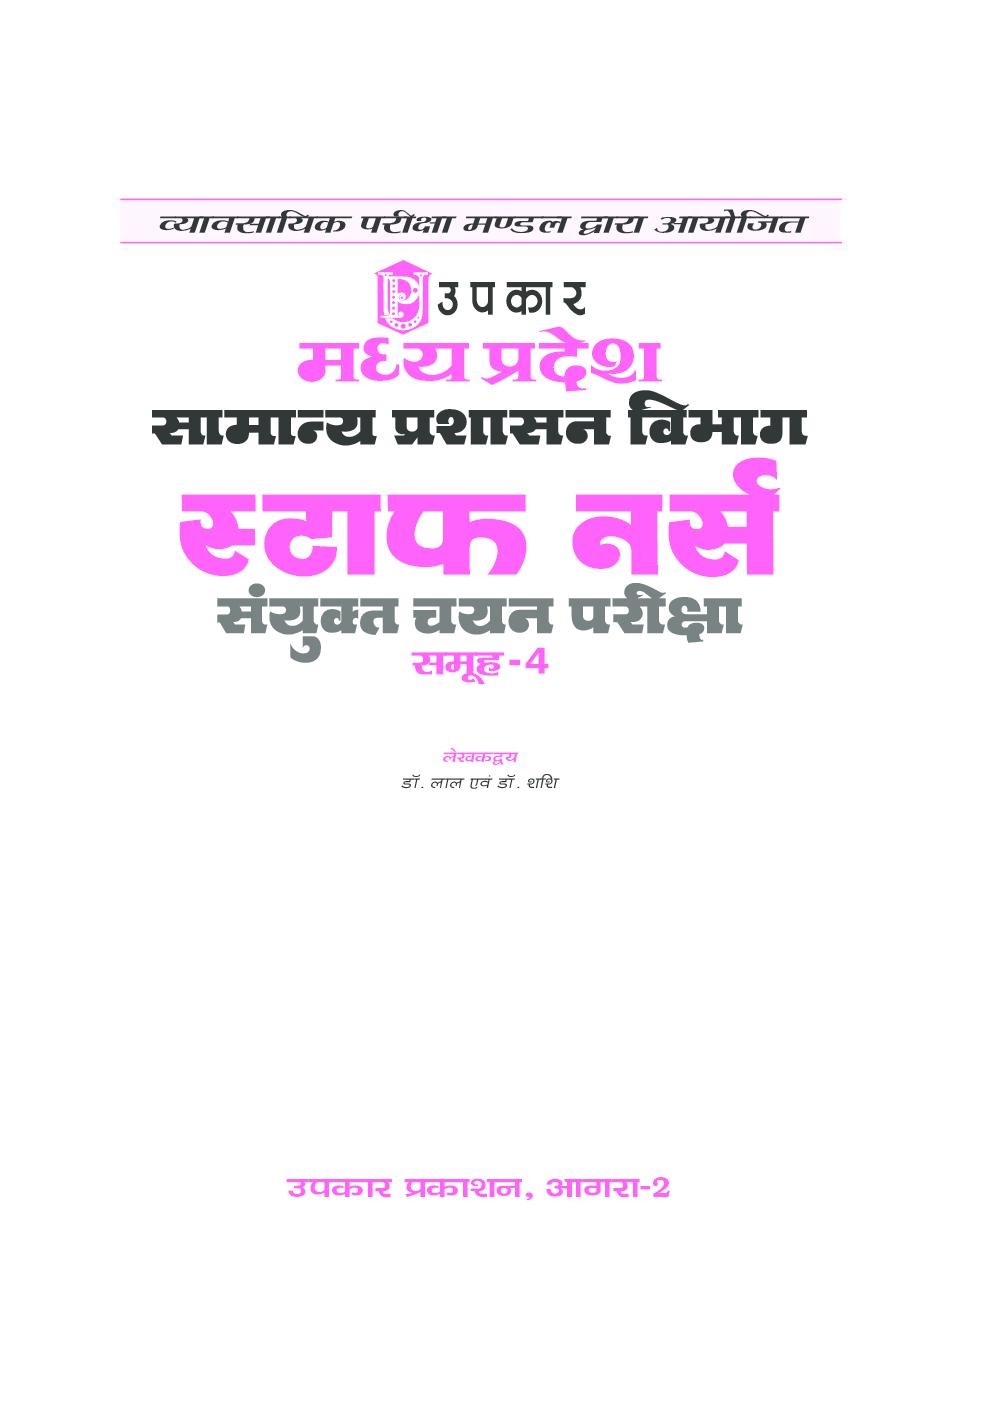 मध्य प्रदेश स्टाफ नर्स संयुक्त चयन परीक्षा - Page 2